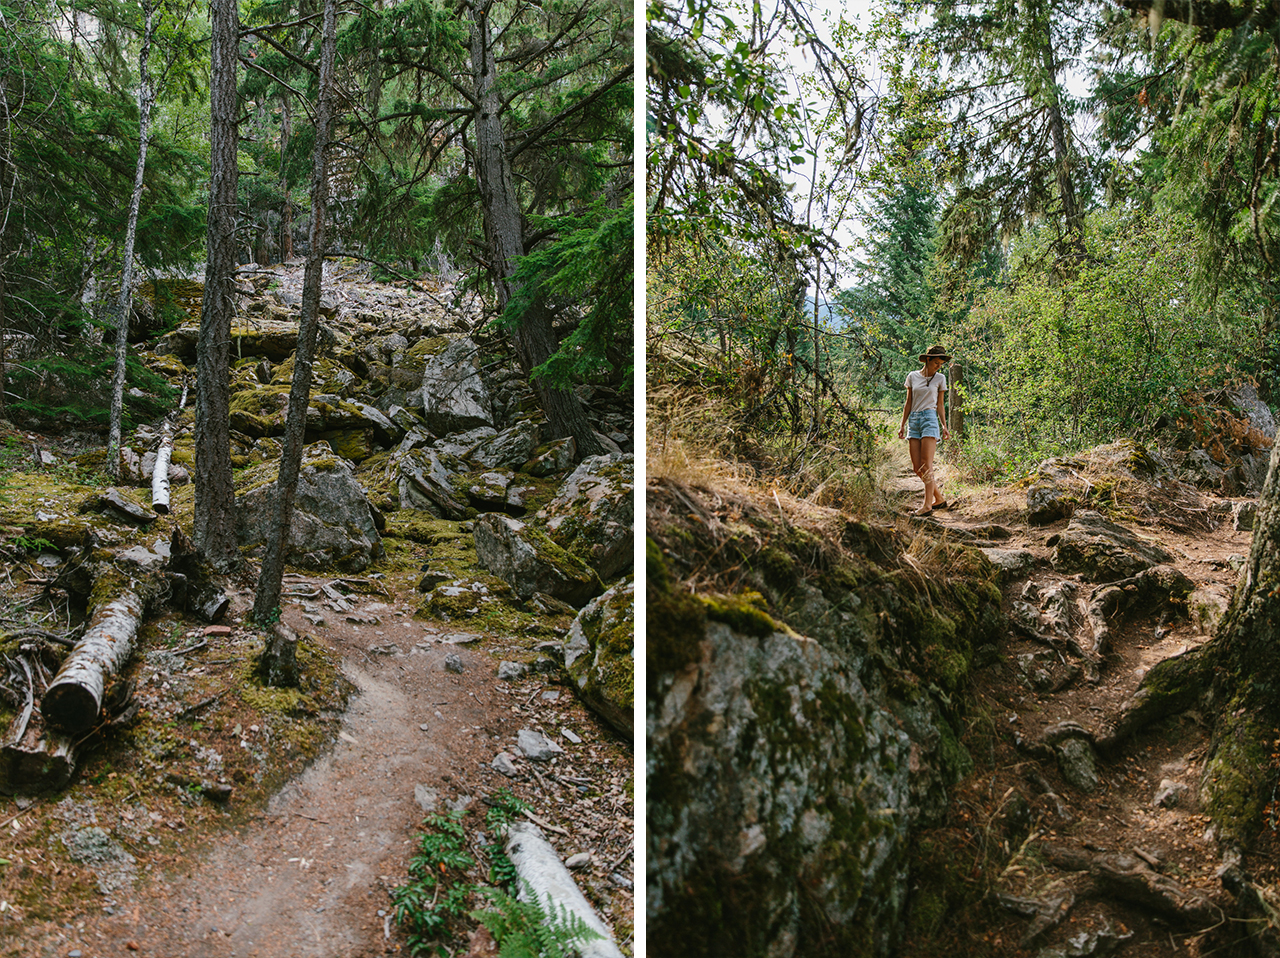 britishcolumbia-canada-lifestyle-photography-mikeseehagel-145